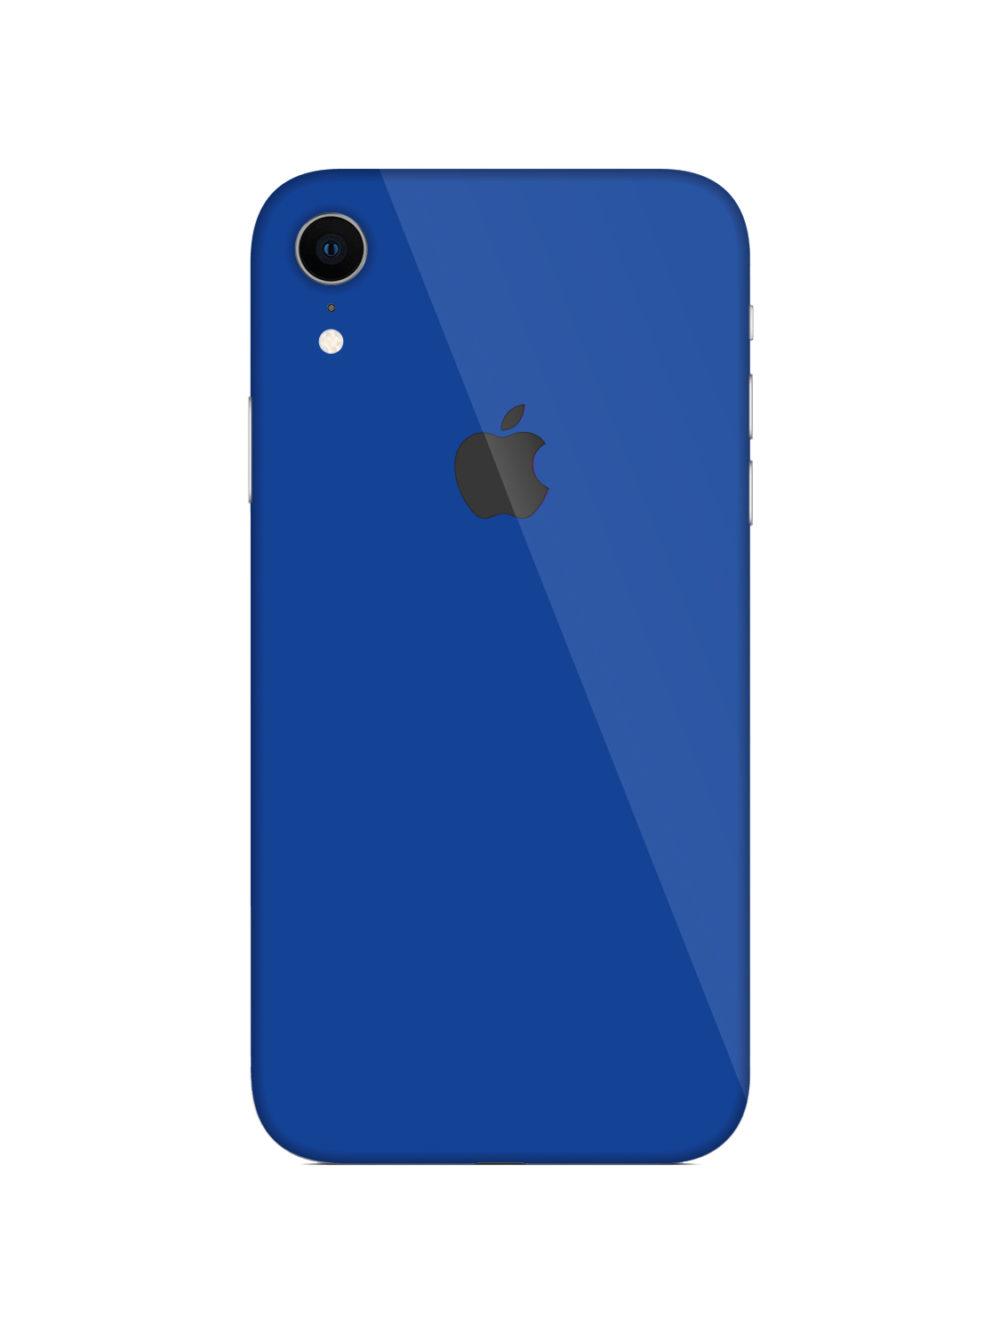 Apple iPhone XR Glossy Vinyl Skin Wrap